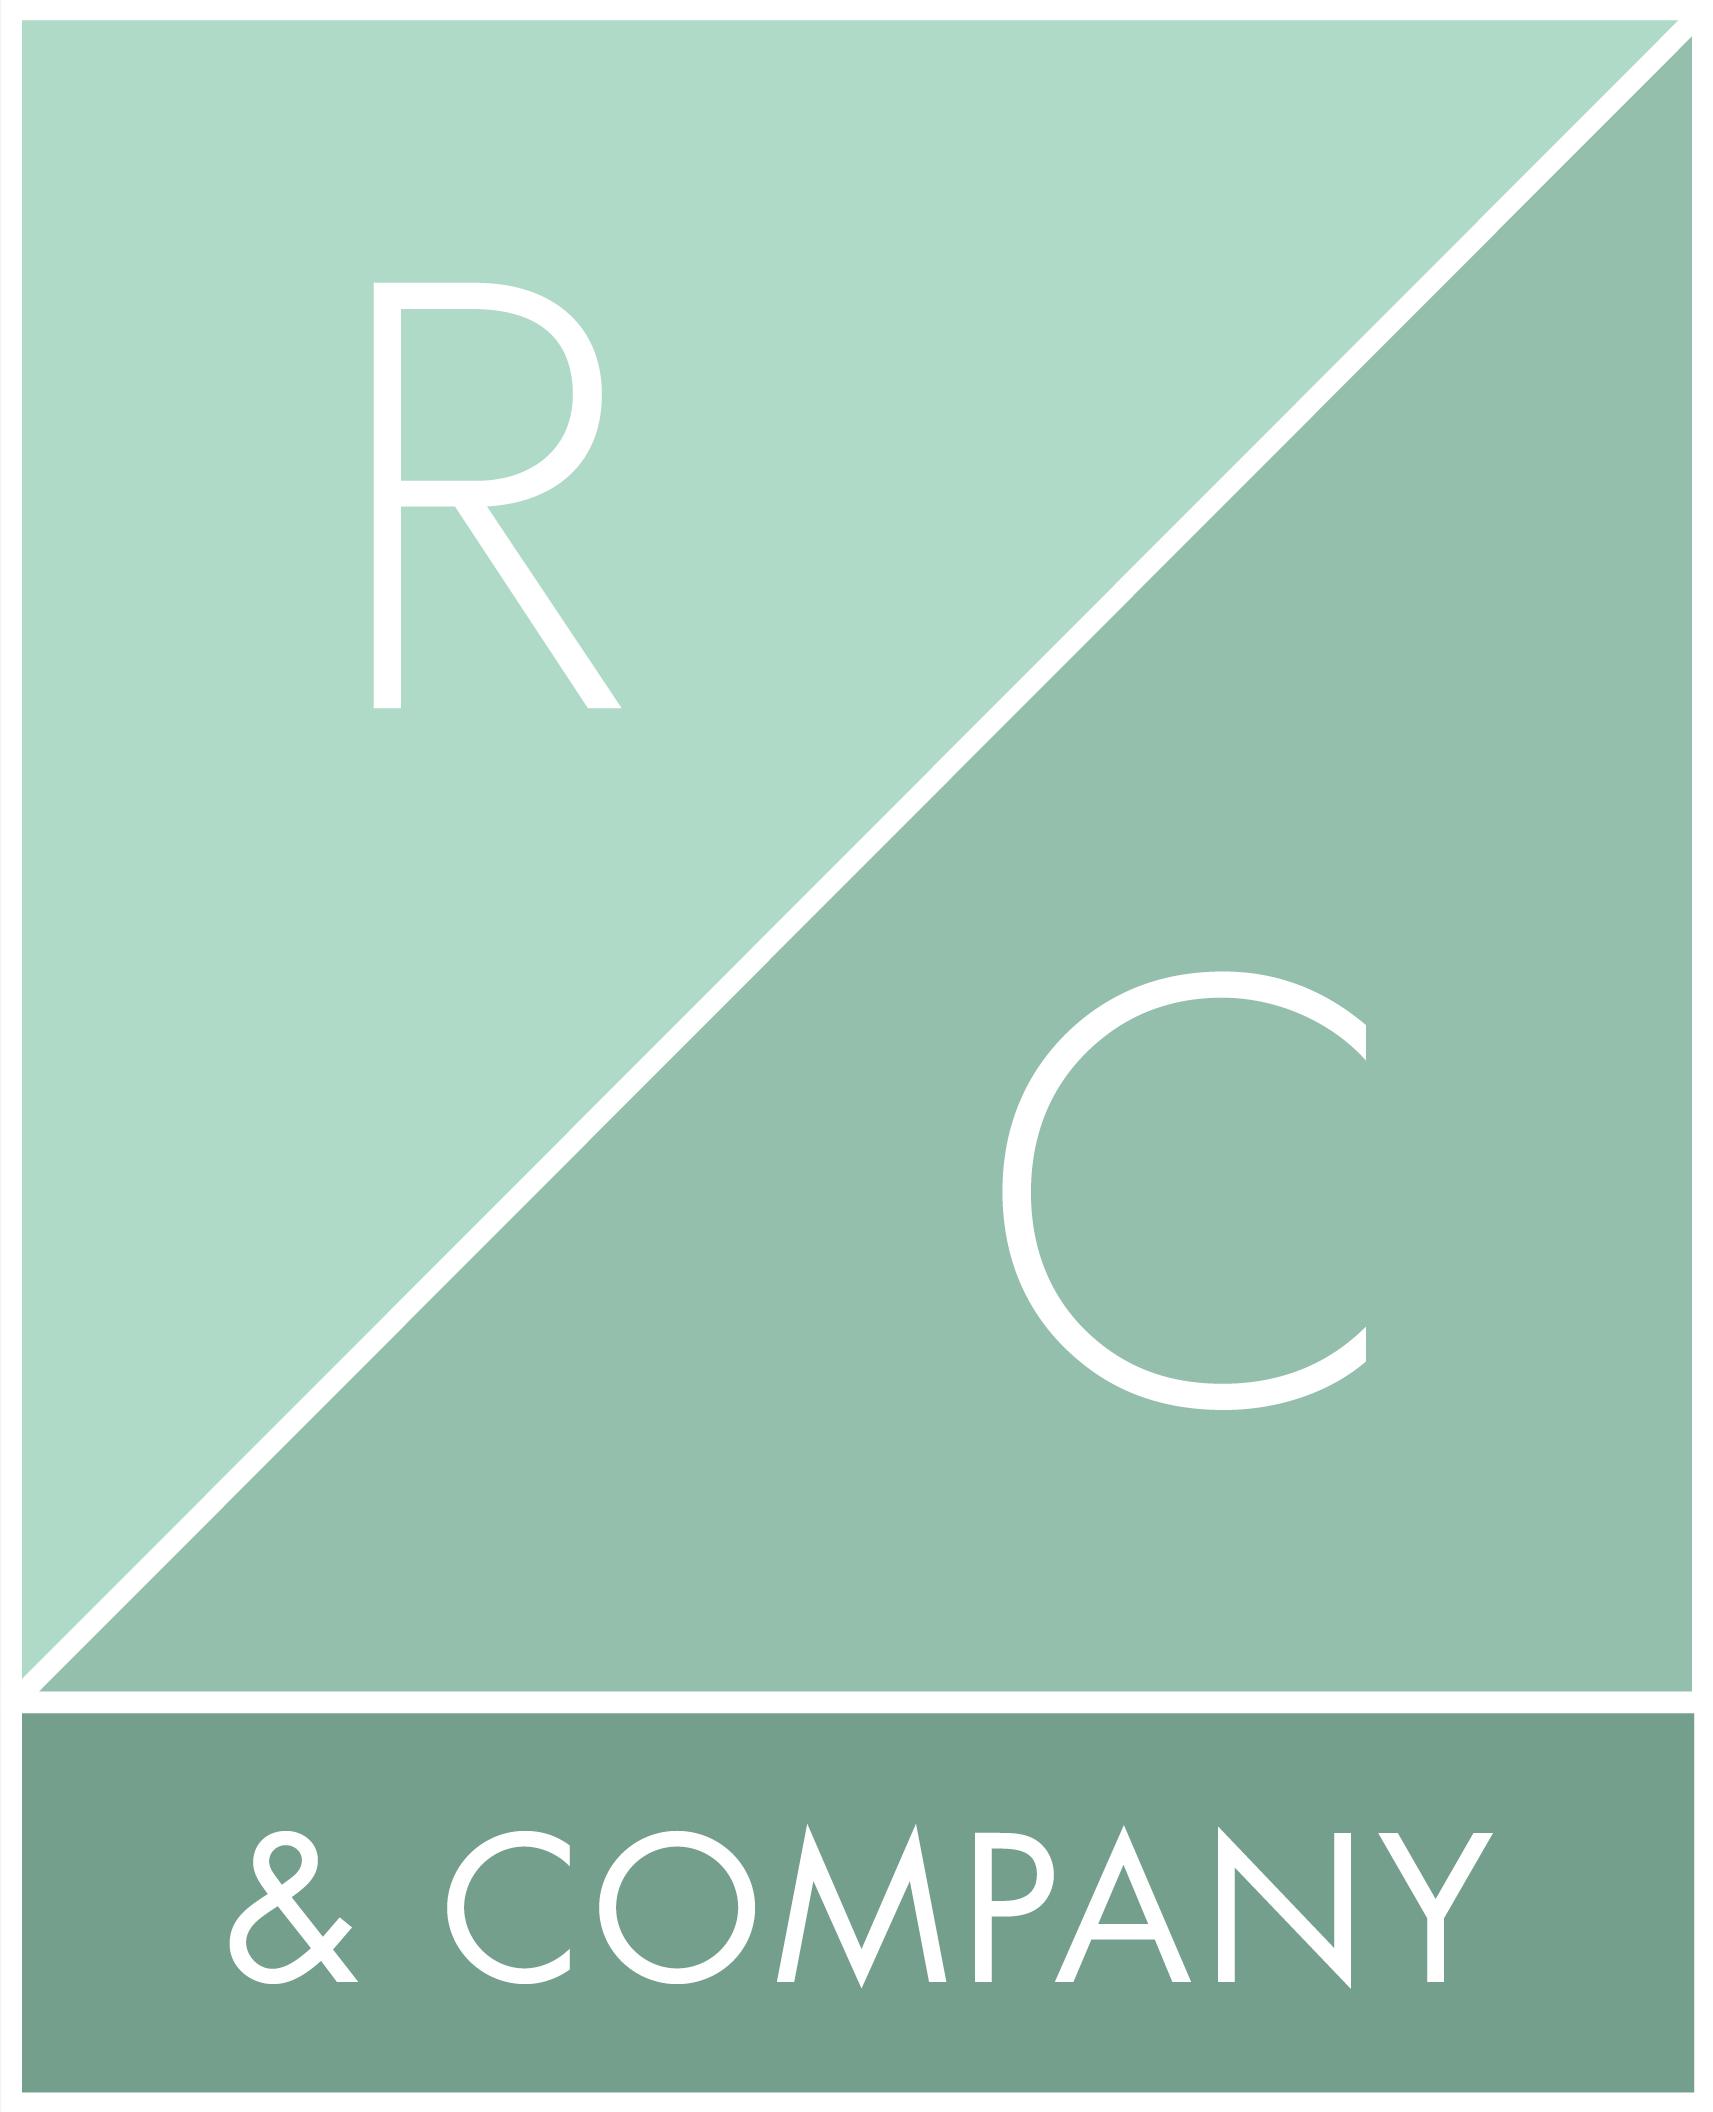 RC & Company